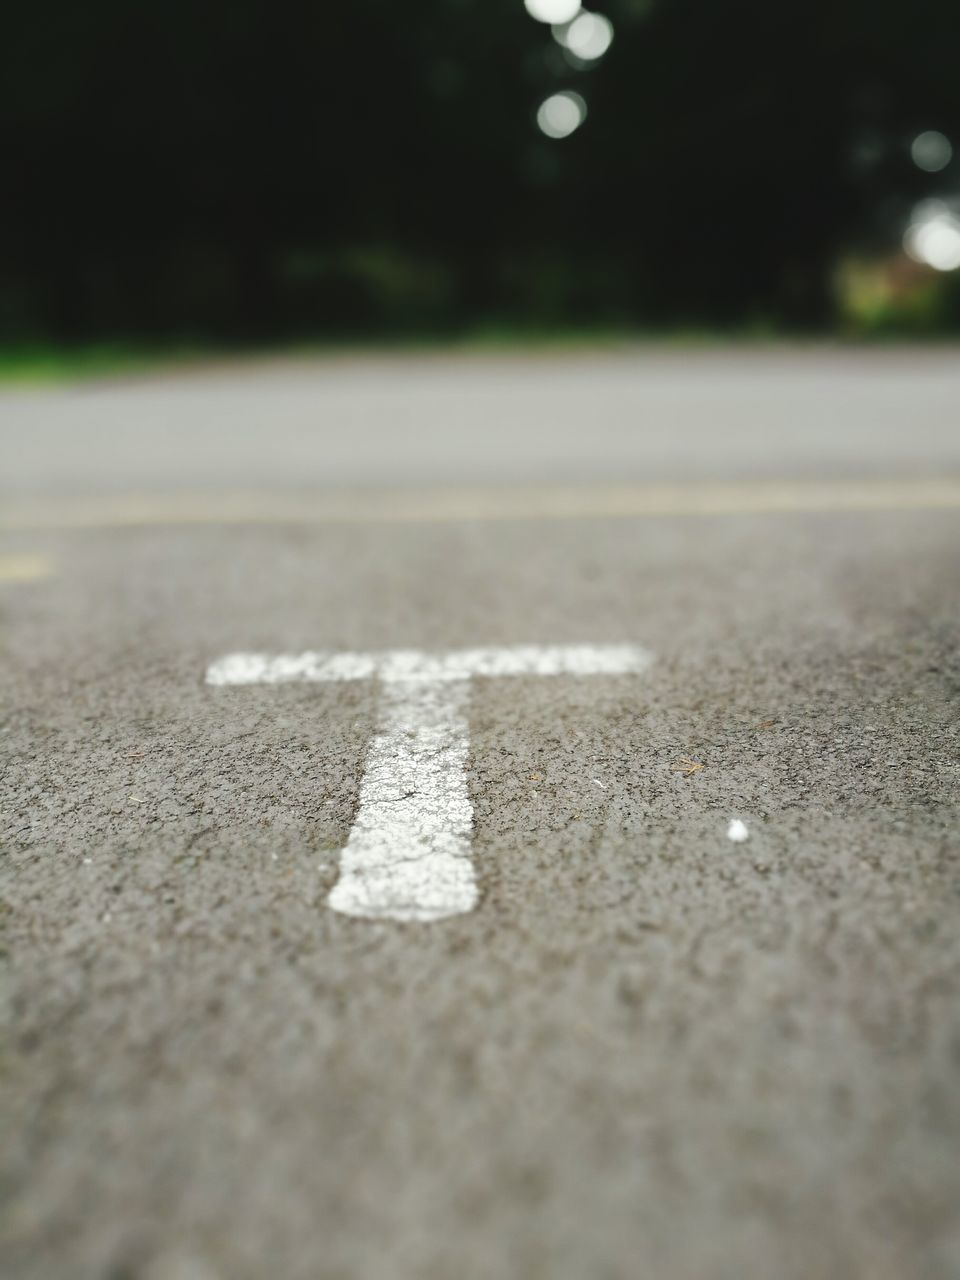 asphalt, surface level, road, outdoors, street, day, no people, transportation, hopscotch, close-up